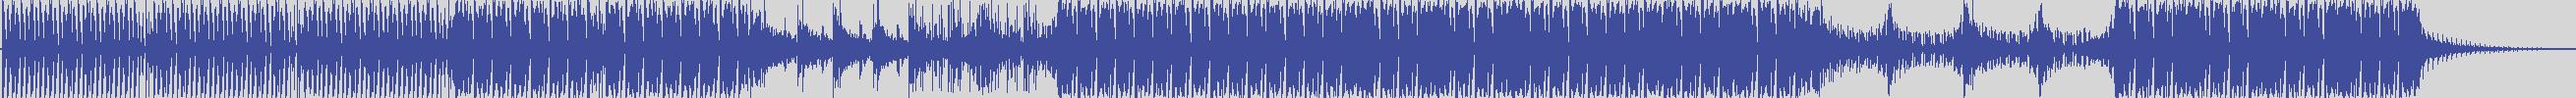 workin [WRK011] Amoeba - Piper [Night Dust Mix] audio wave form